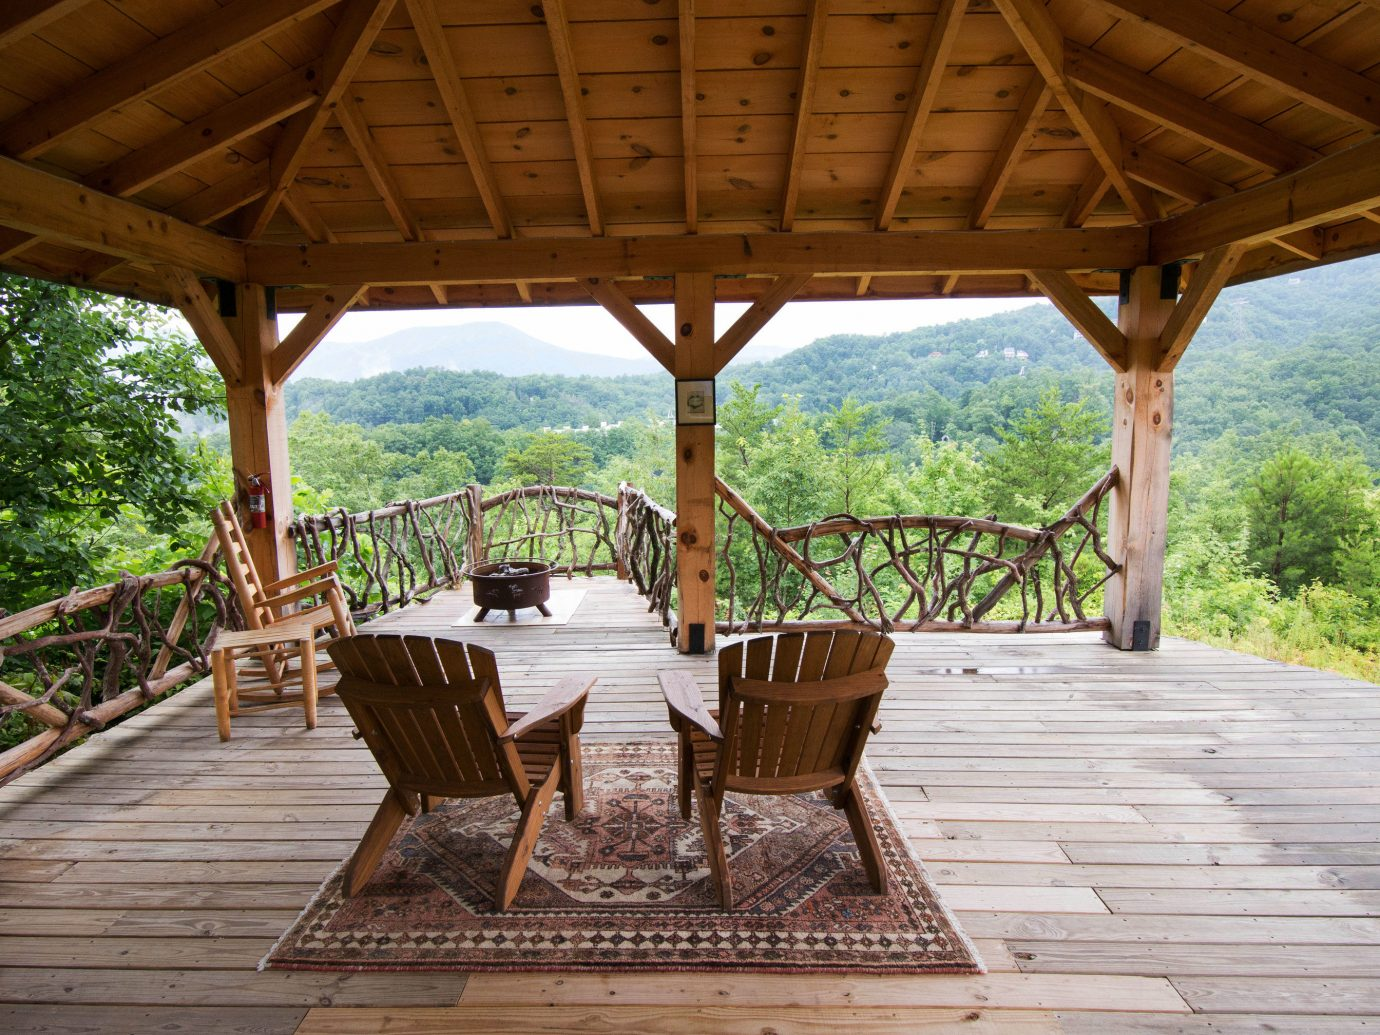 Trip Ideas outdoor building wooden gazebo outdoor structure Resort wood estate Villa cottage porch furniture